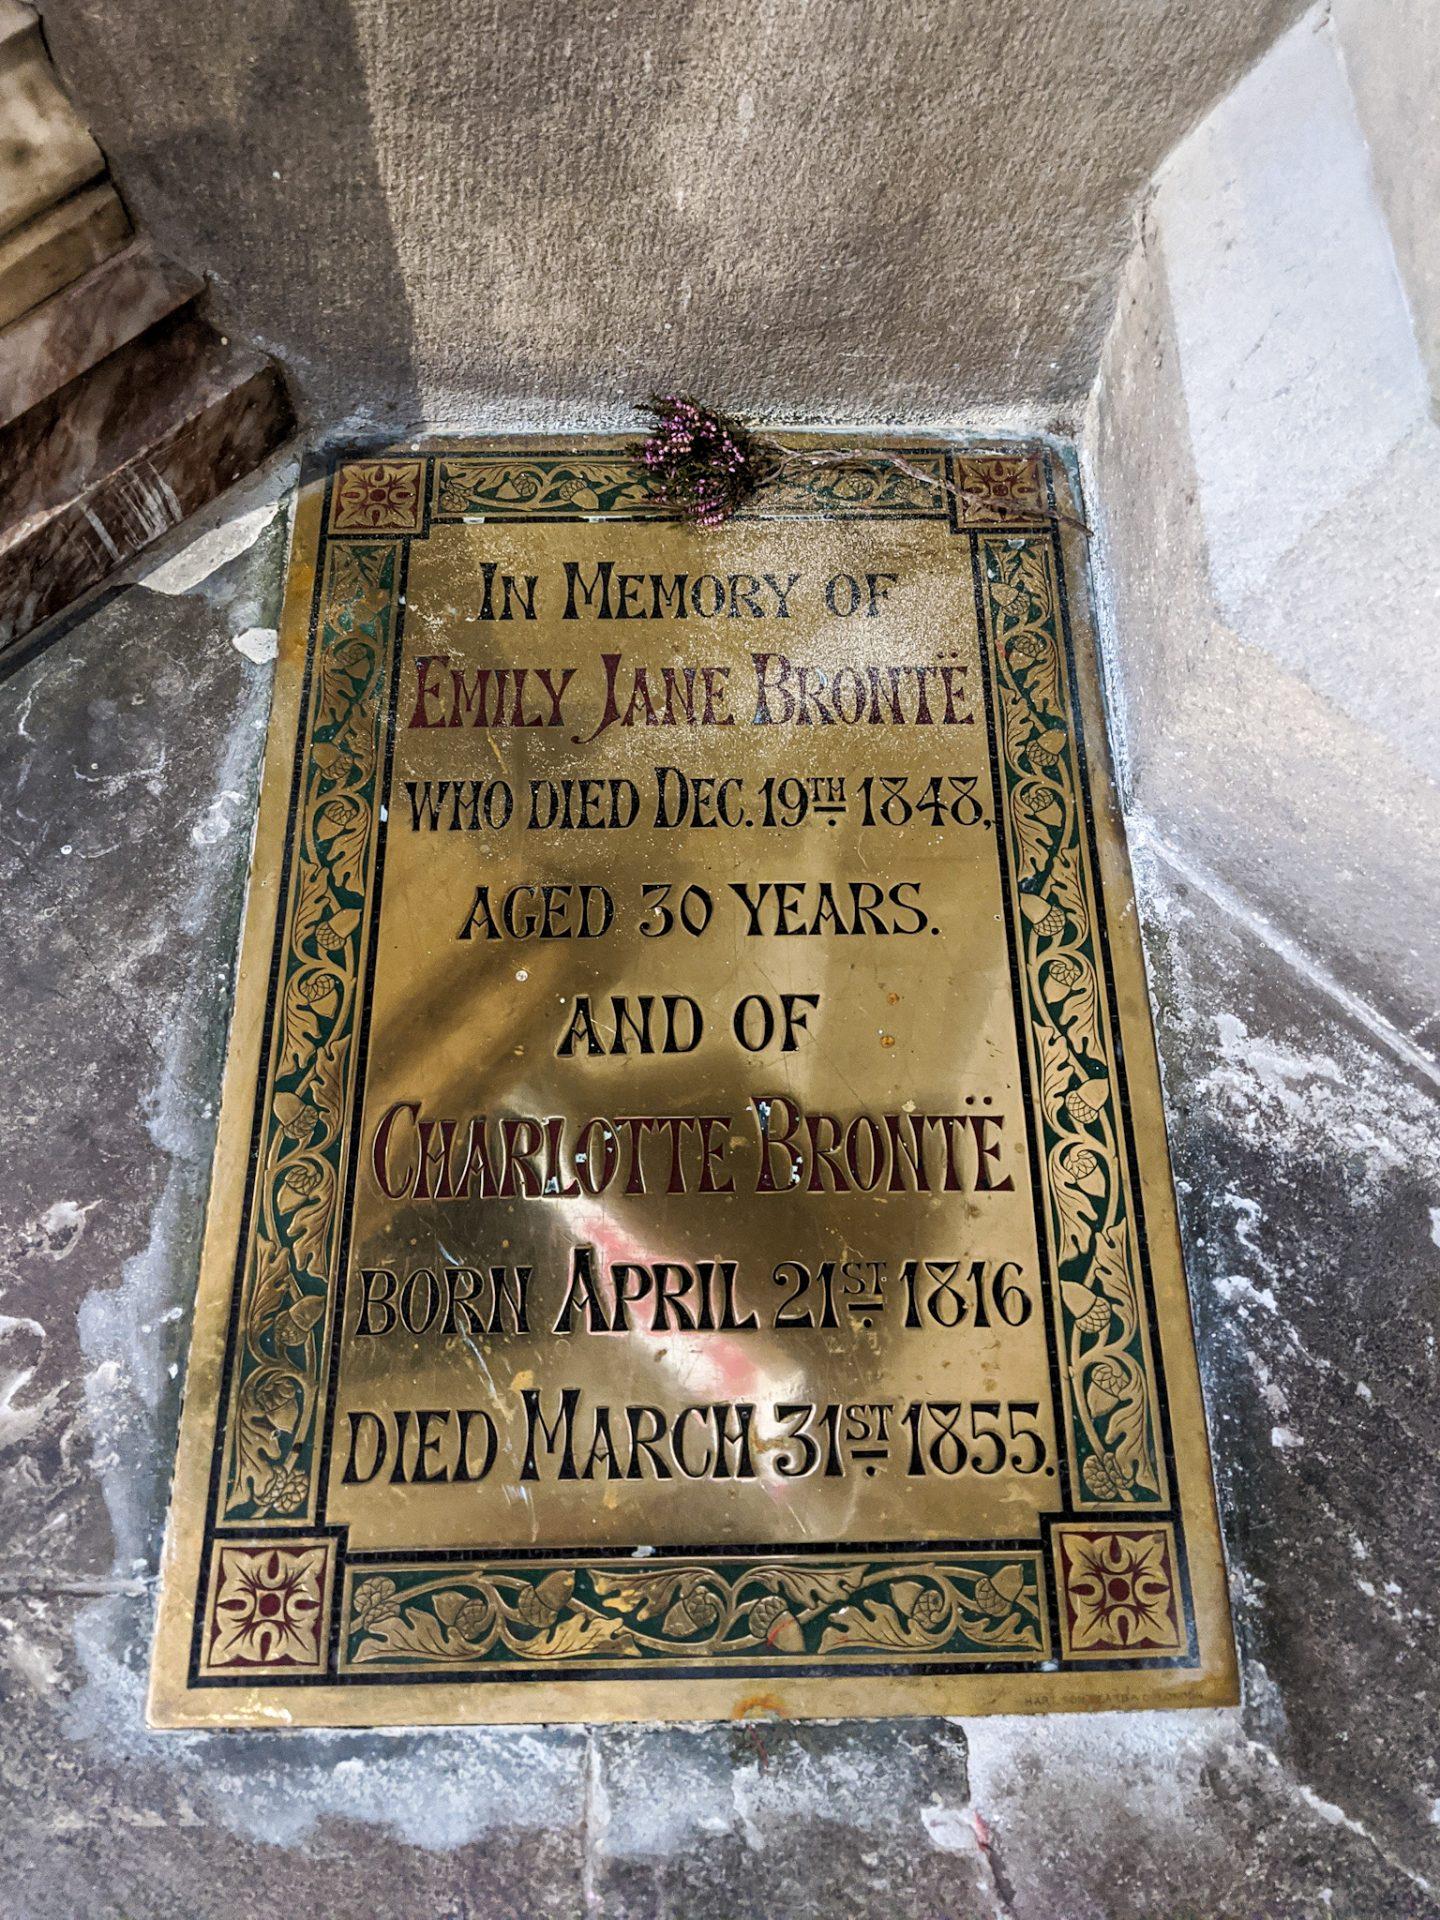 Memorial plaque to Emily Jane Brontë and Charlotte Brontë